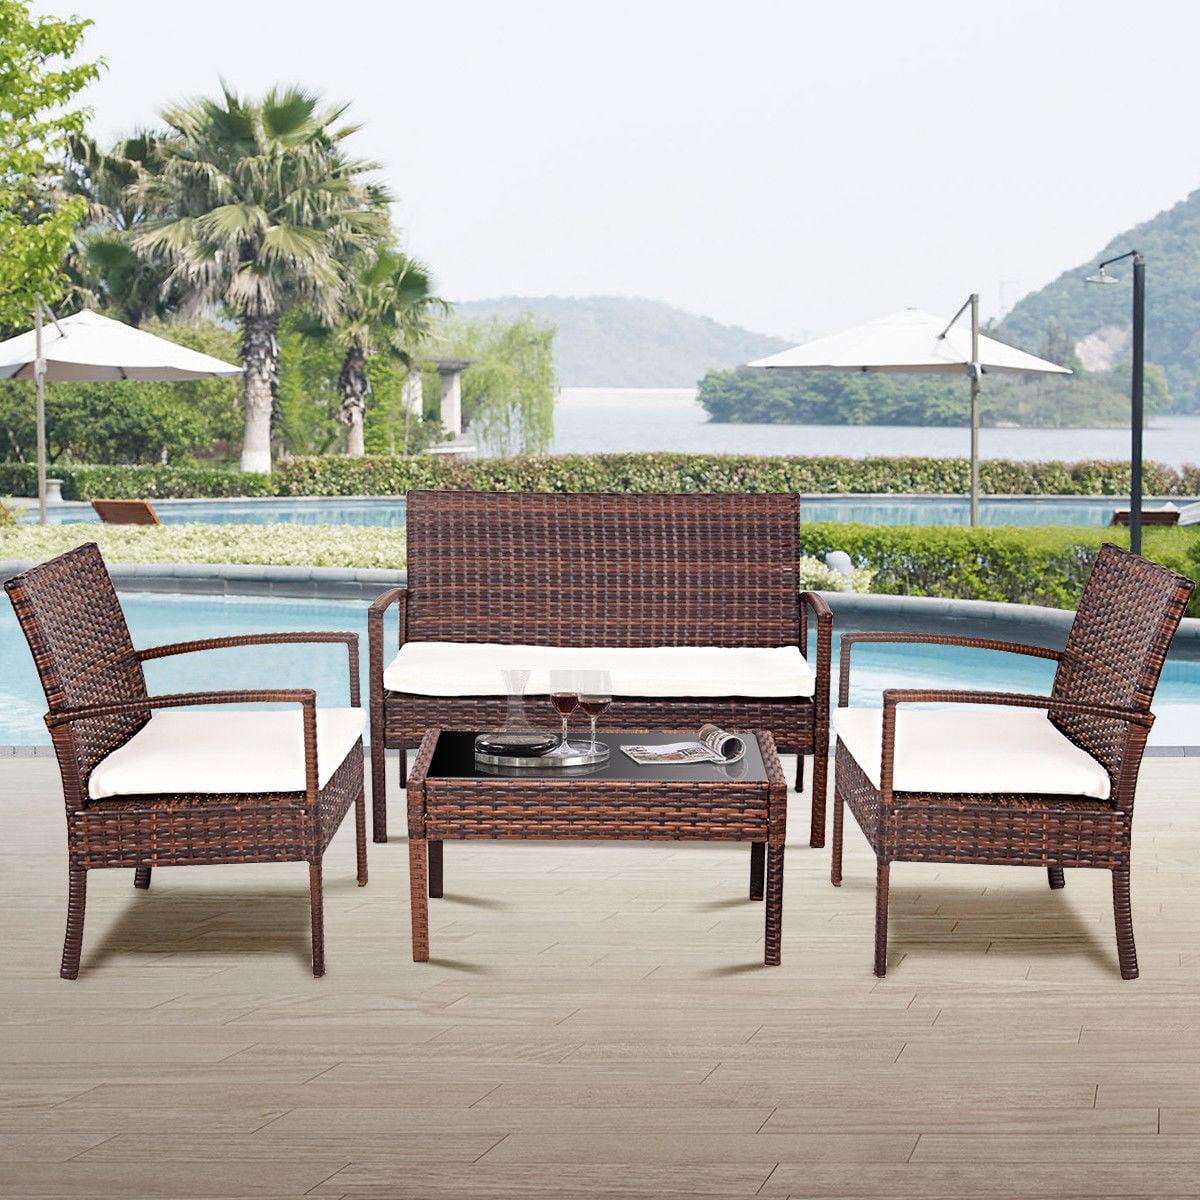 Brown Wicker Patio Furniture.Costway 4 Pc Rattan Patio Furniture Set Garden Lawn Sofa Wicker Cushioned Seat Brown